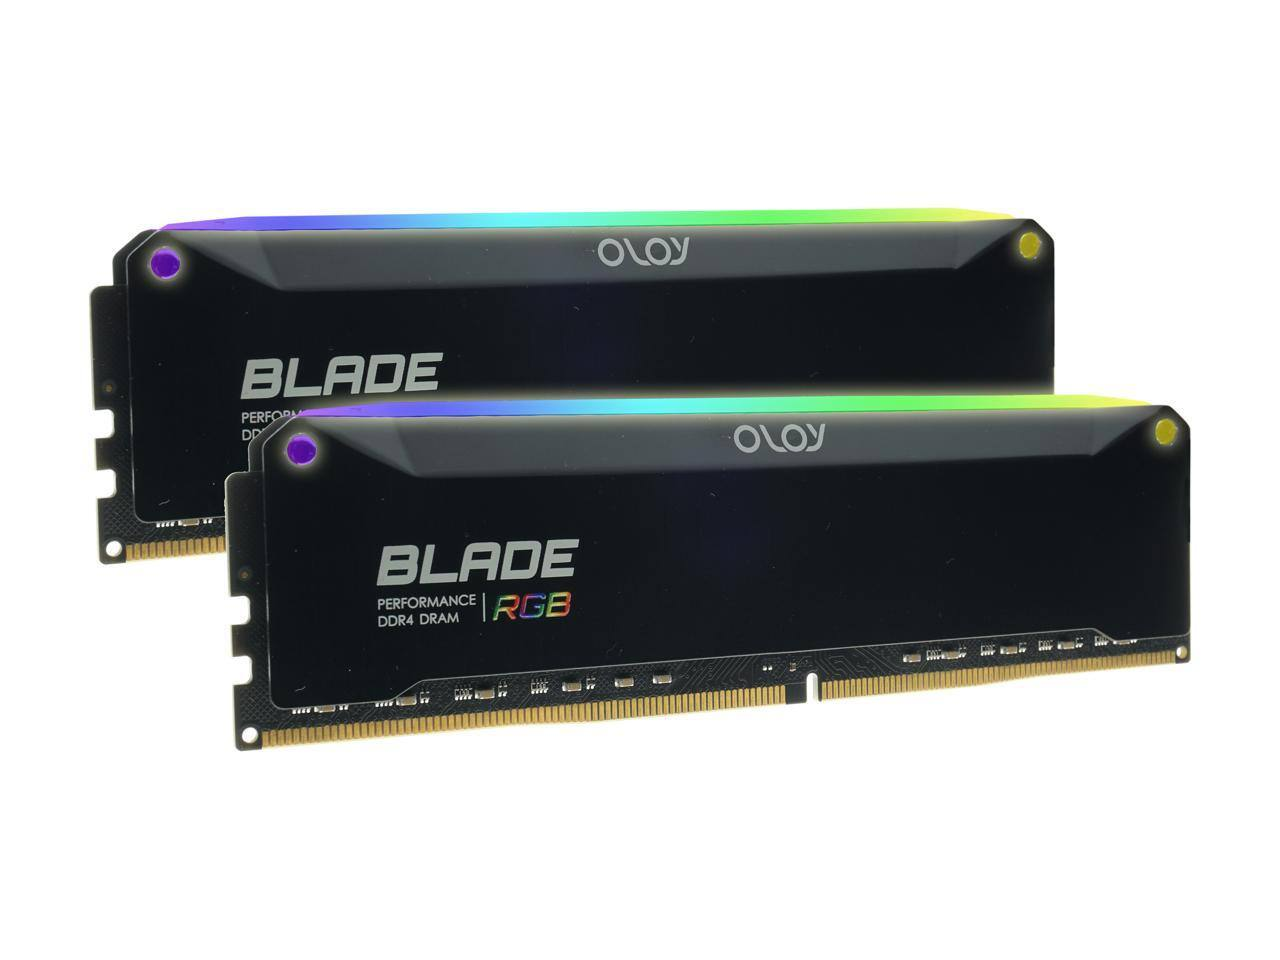 32GB (2x 16) OLOy Blade RGB DDR4 3200 Desktop RAM kit @Newegg $140